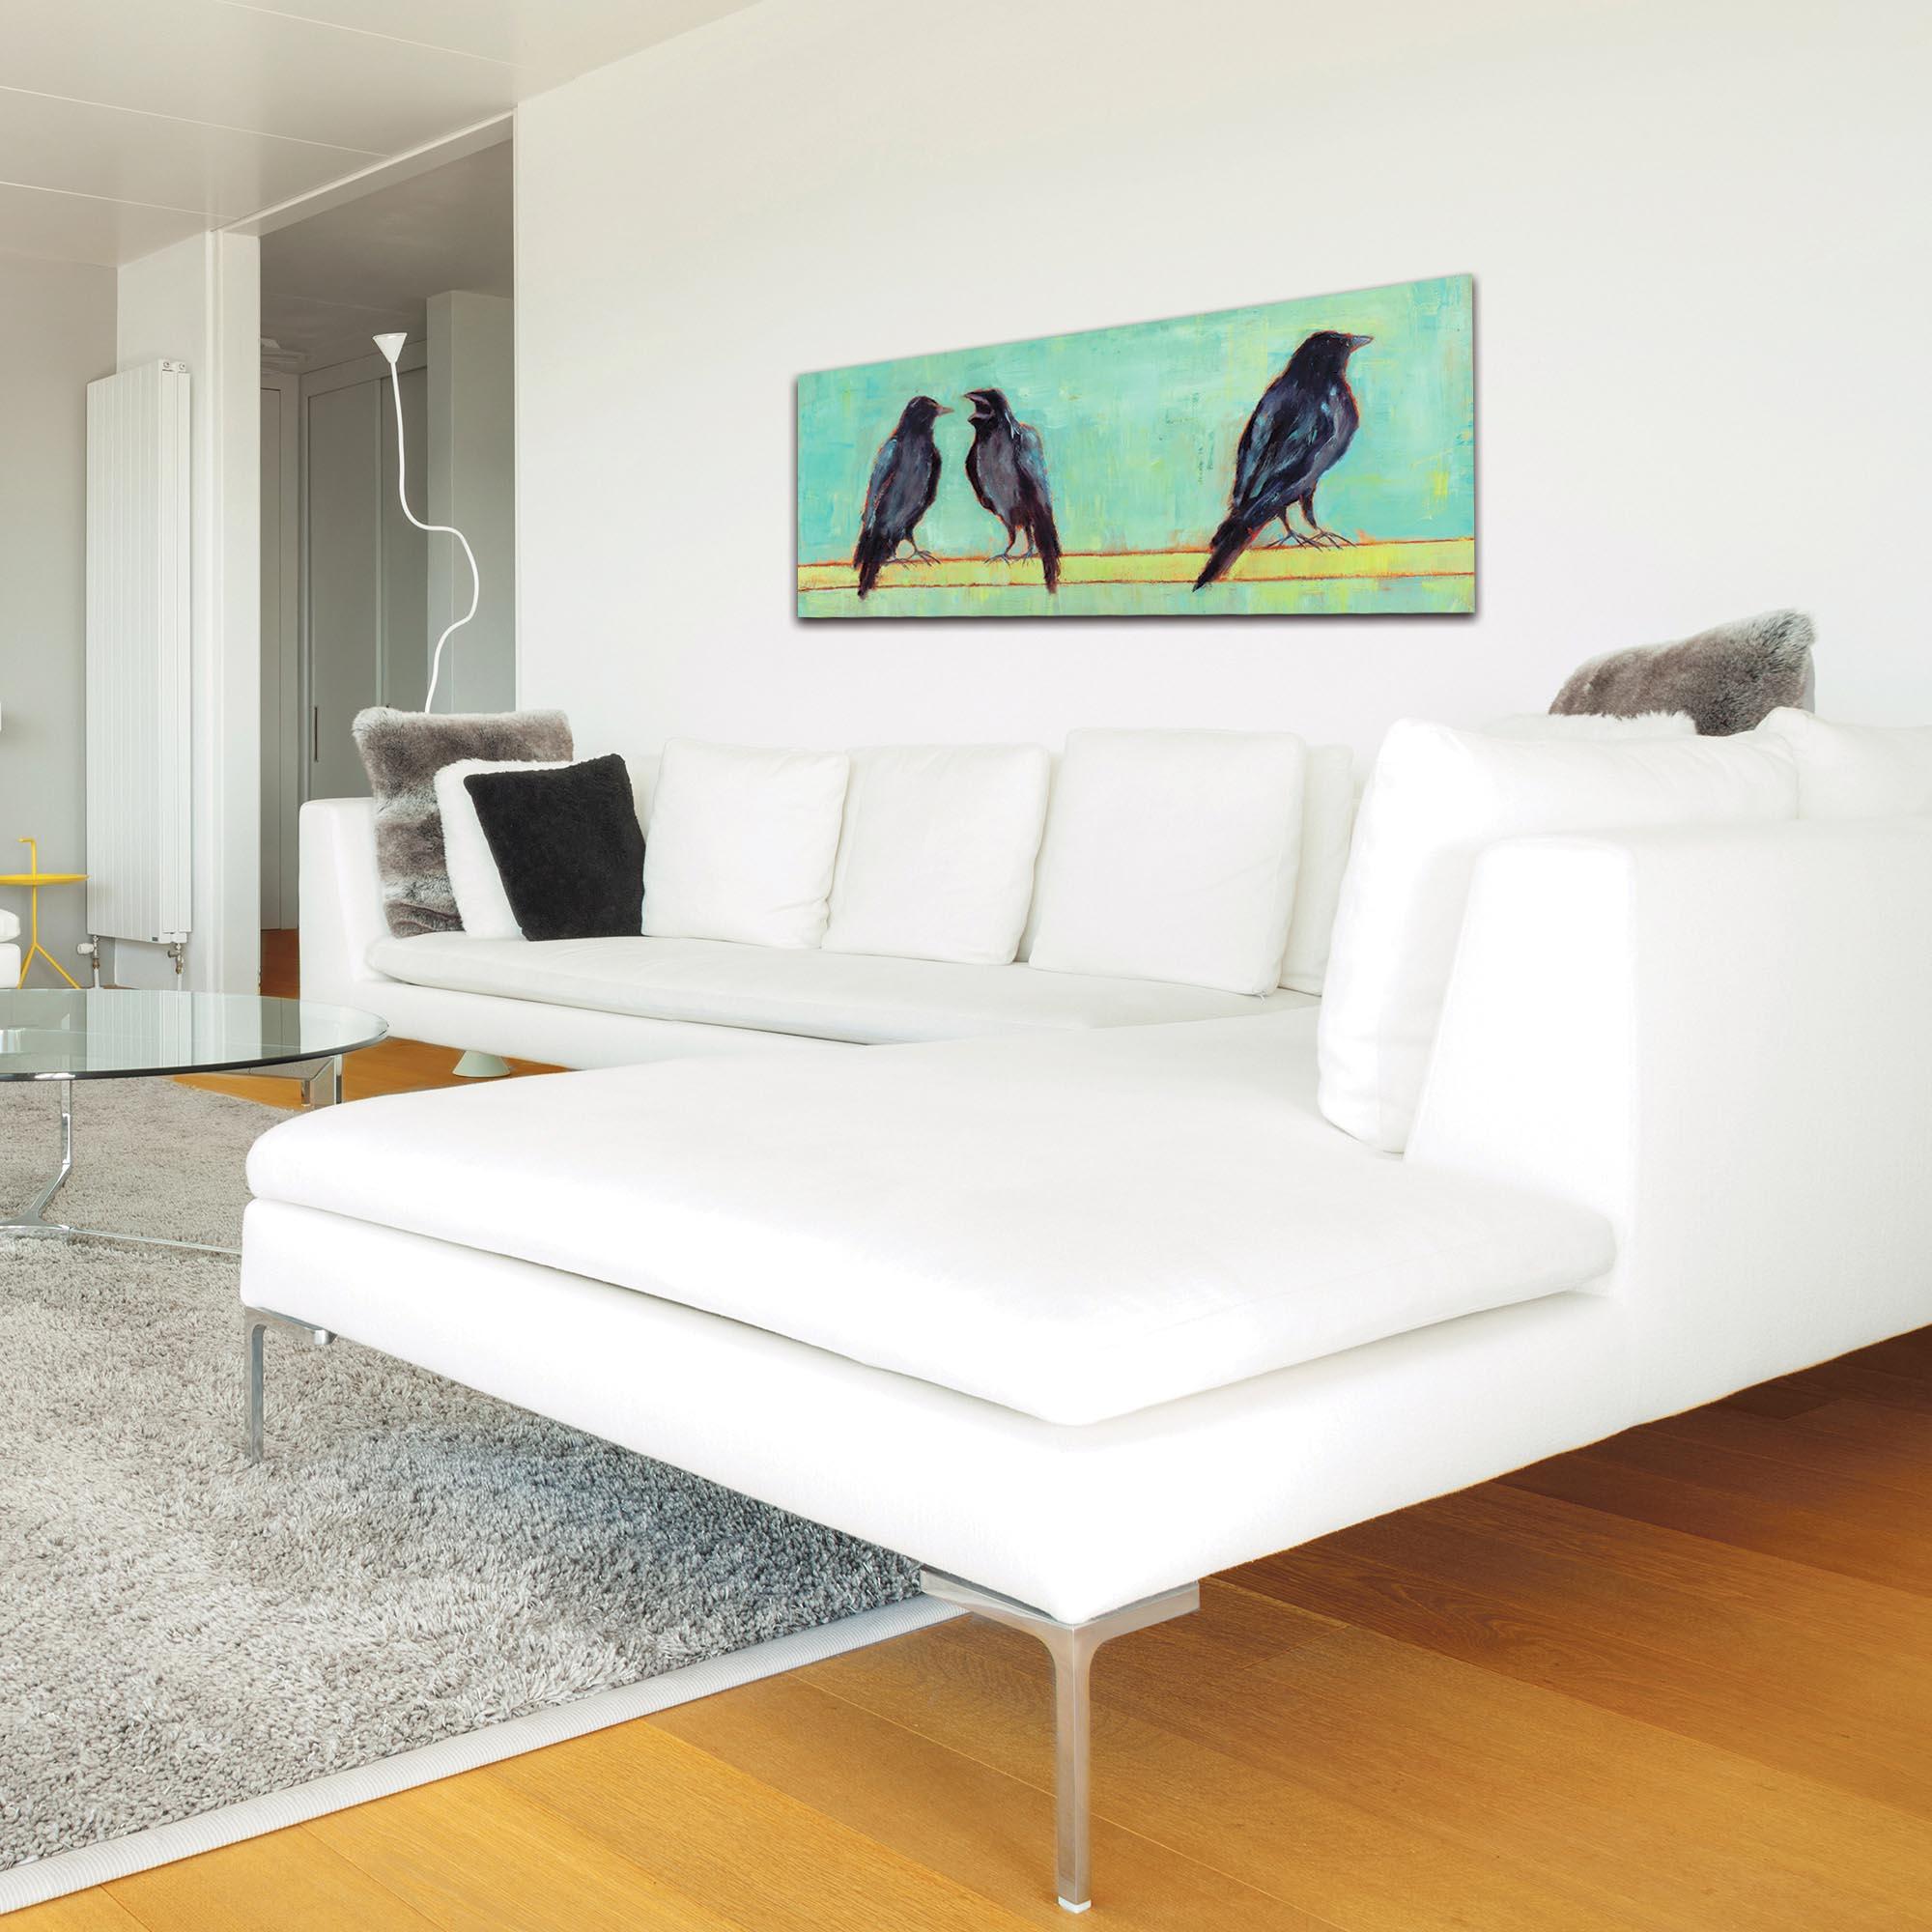 Contemporary Wall Art 'Crow Bar 2 v2' - Urban Birds Decor on Metal or Plexiglass - Lifestyle View